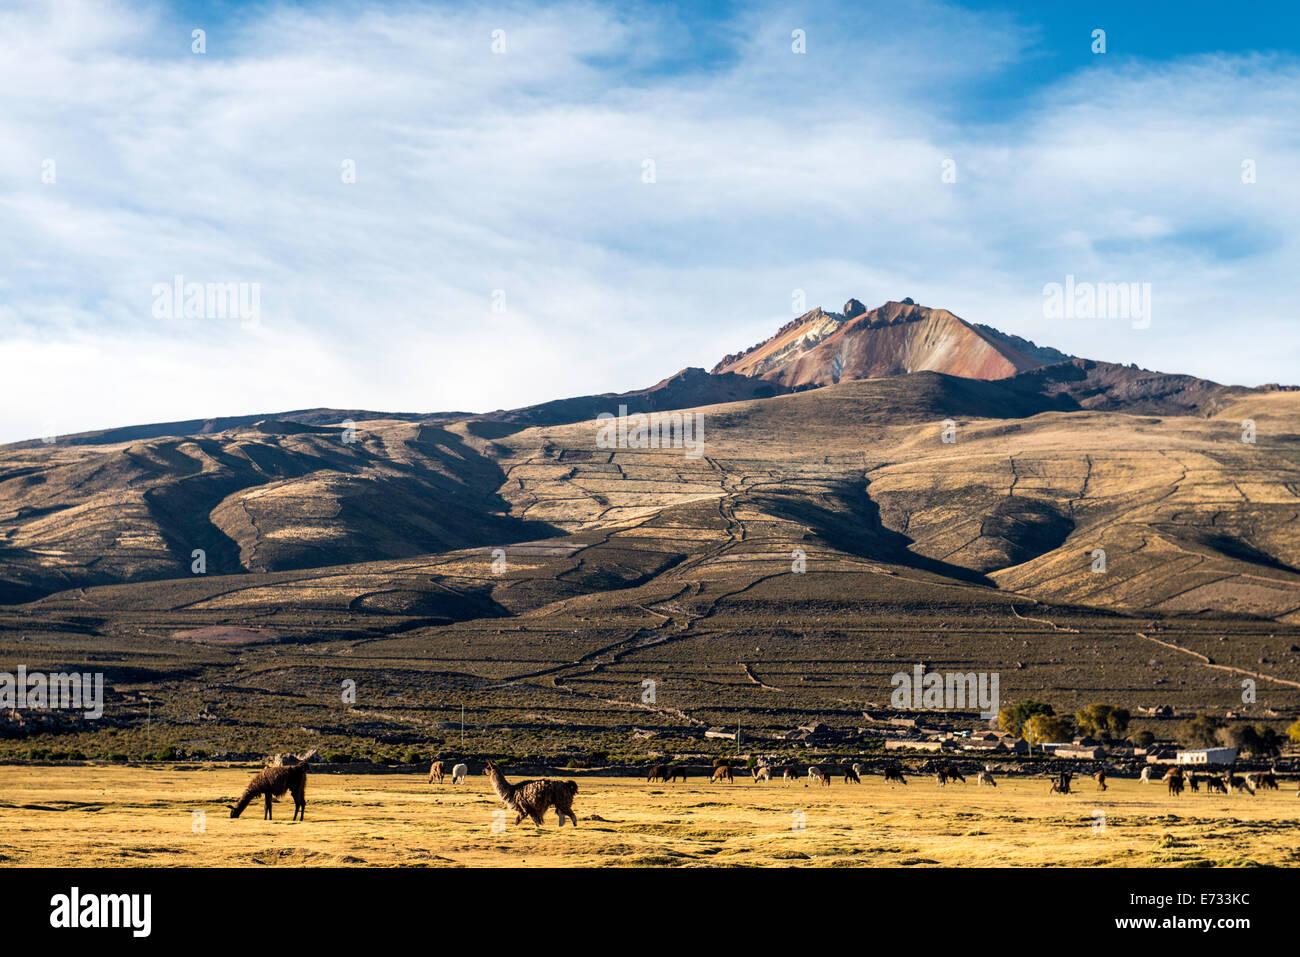 Volcano Tunupa and llamas in Potosi Bolivia, South America - Stock Image